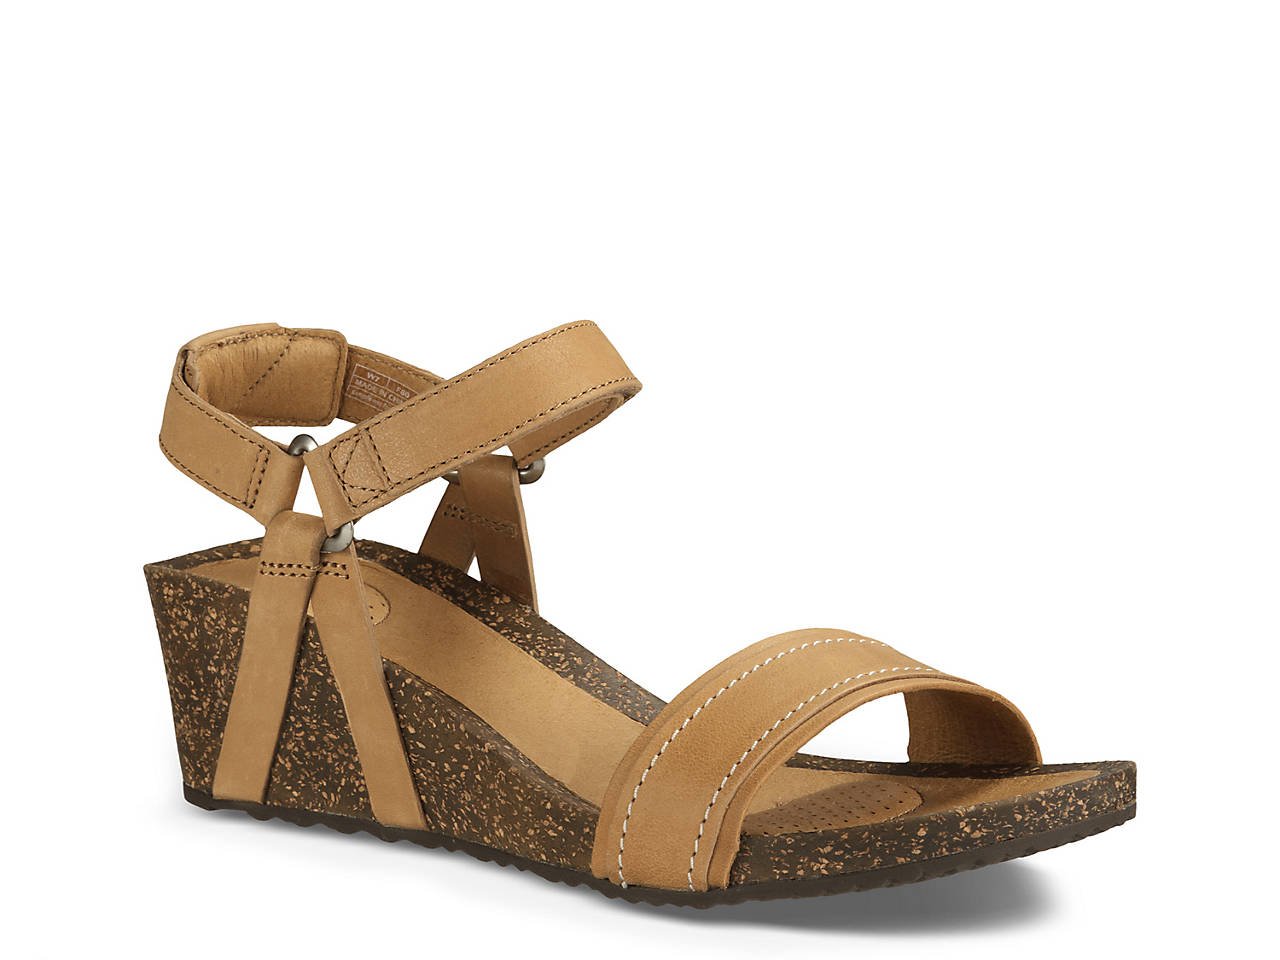 936124c8b Teva Ysidro Stitch Wedge Sandal Women s Shoes